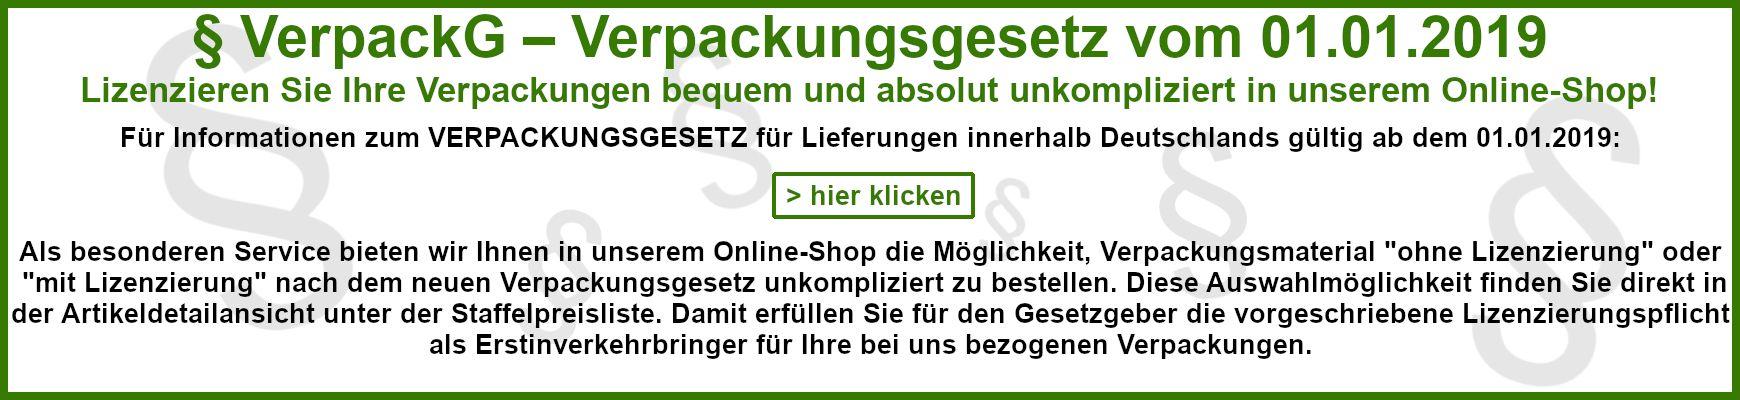 6_Verpackungsgesetz_COMMERCIAL